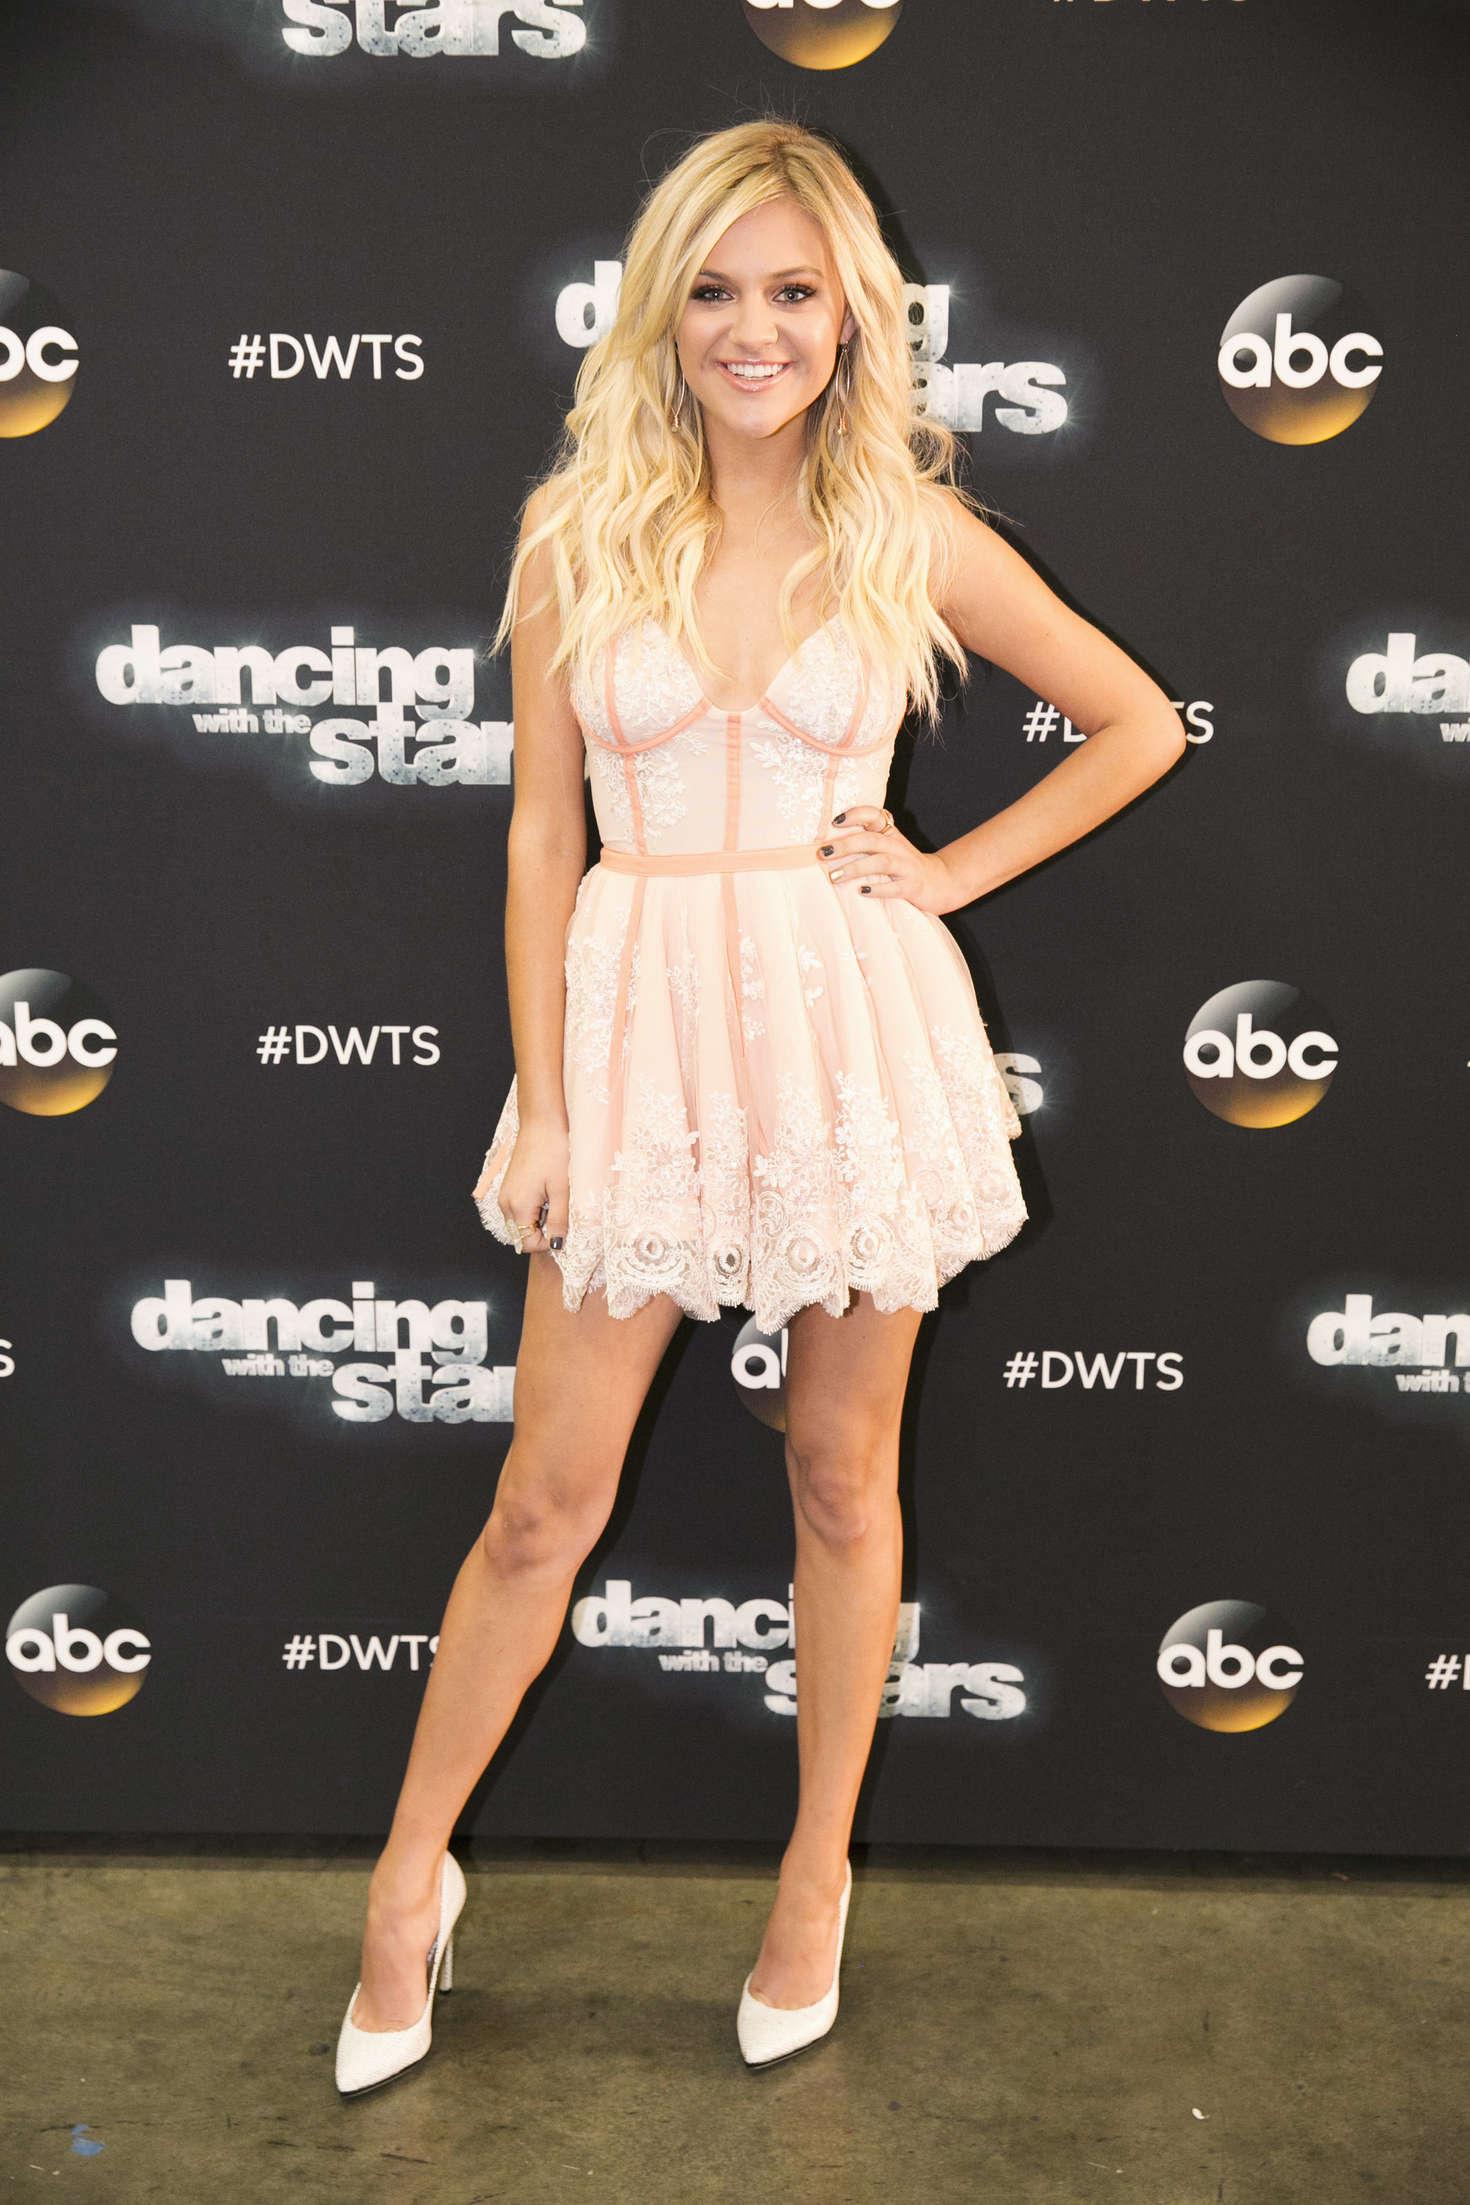 Kelsea Ballerini Dancing With The Stars Season Finale